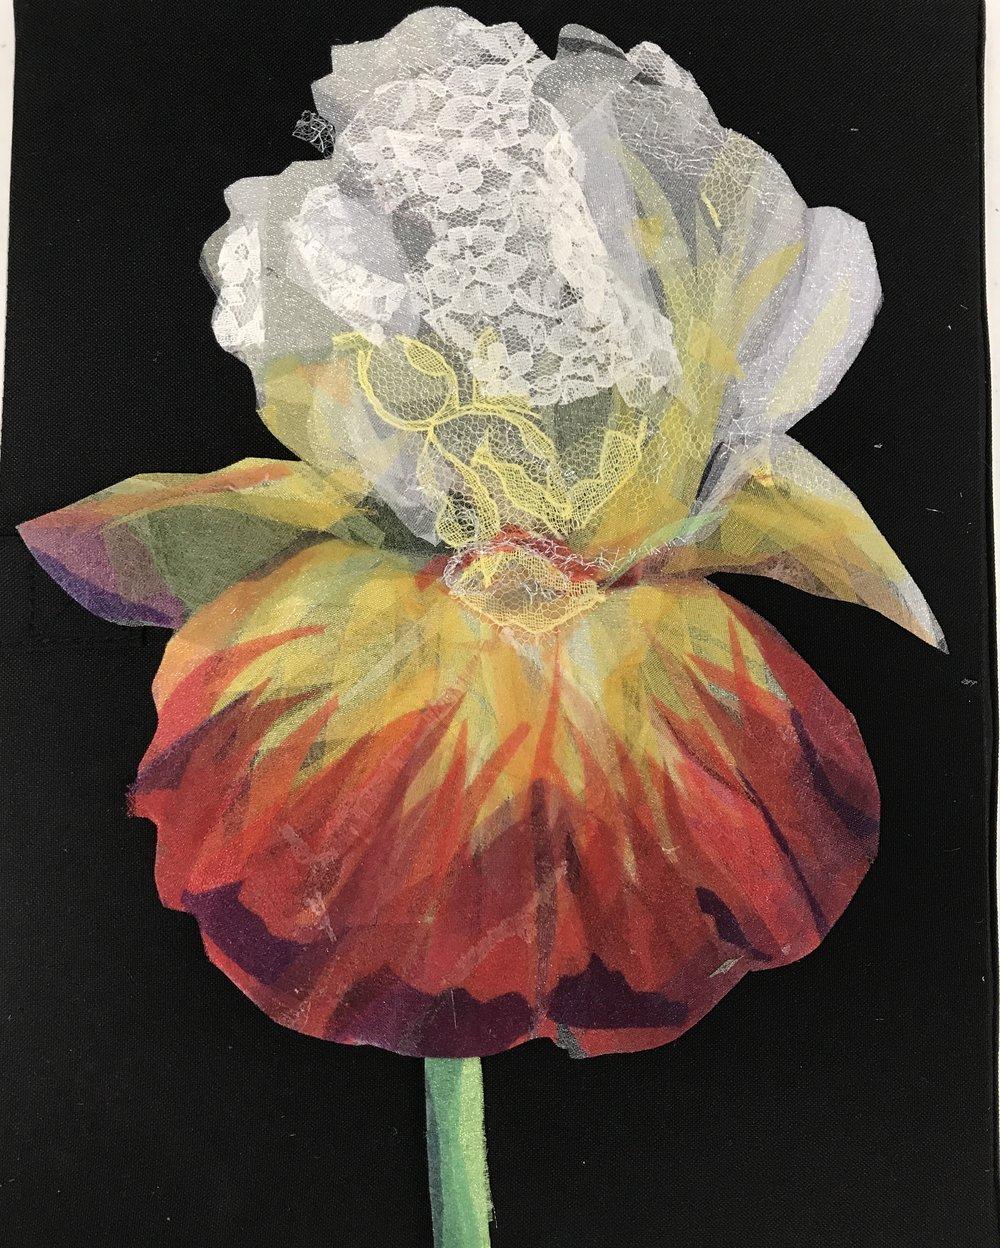 Sheer Iris image 2.jpg